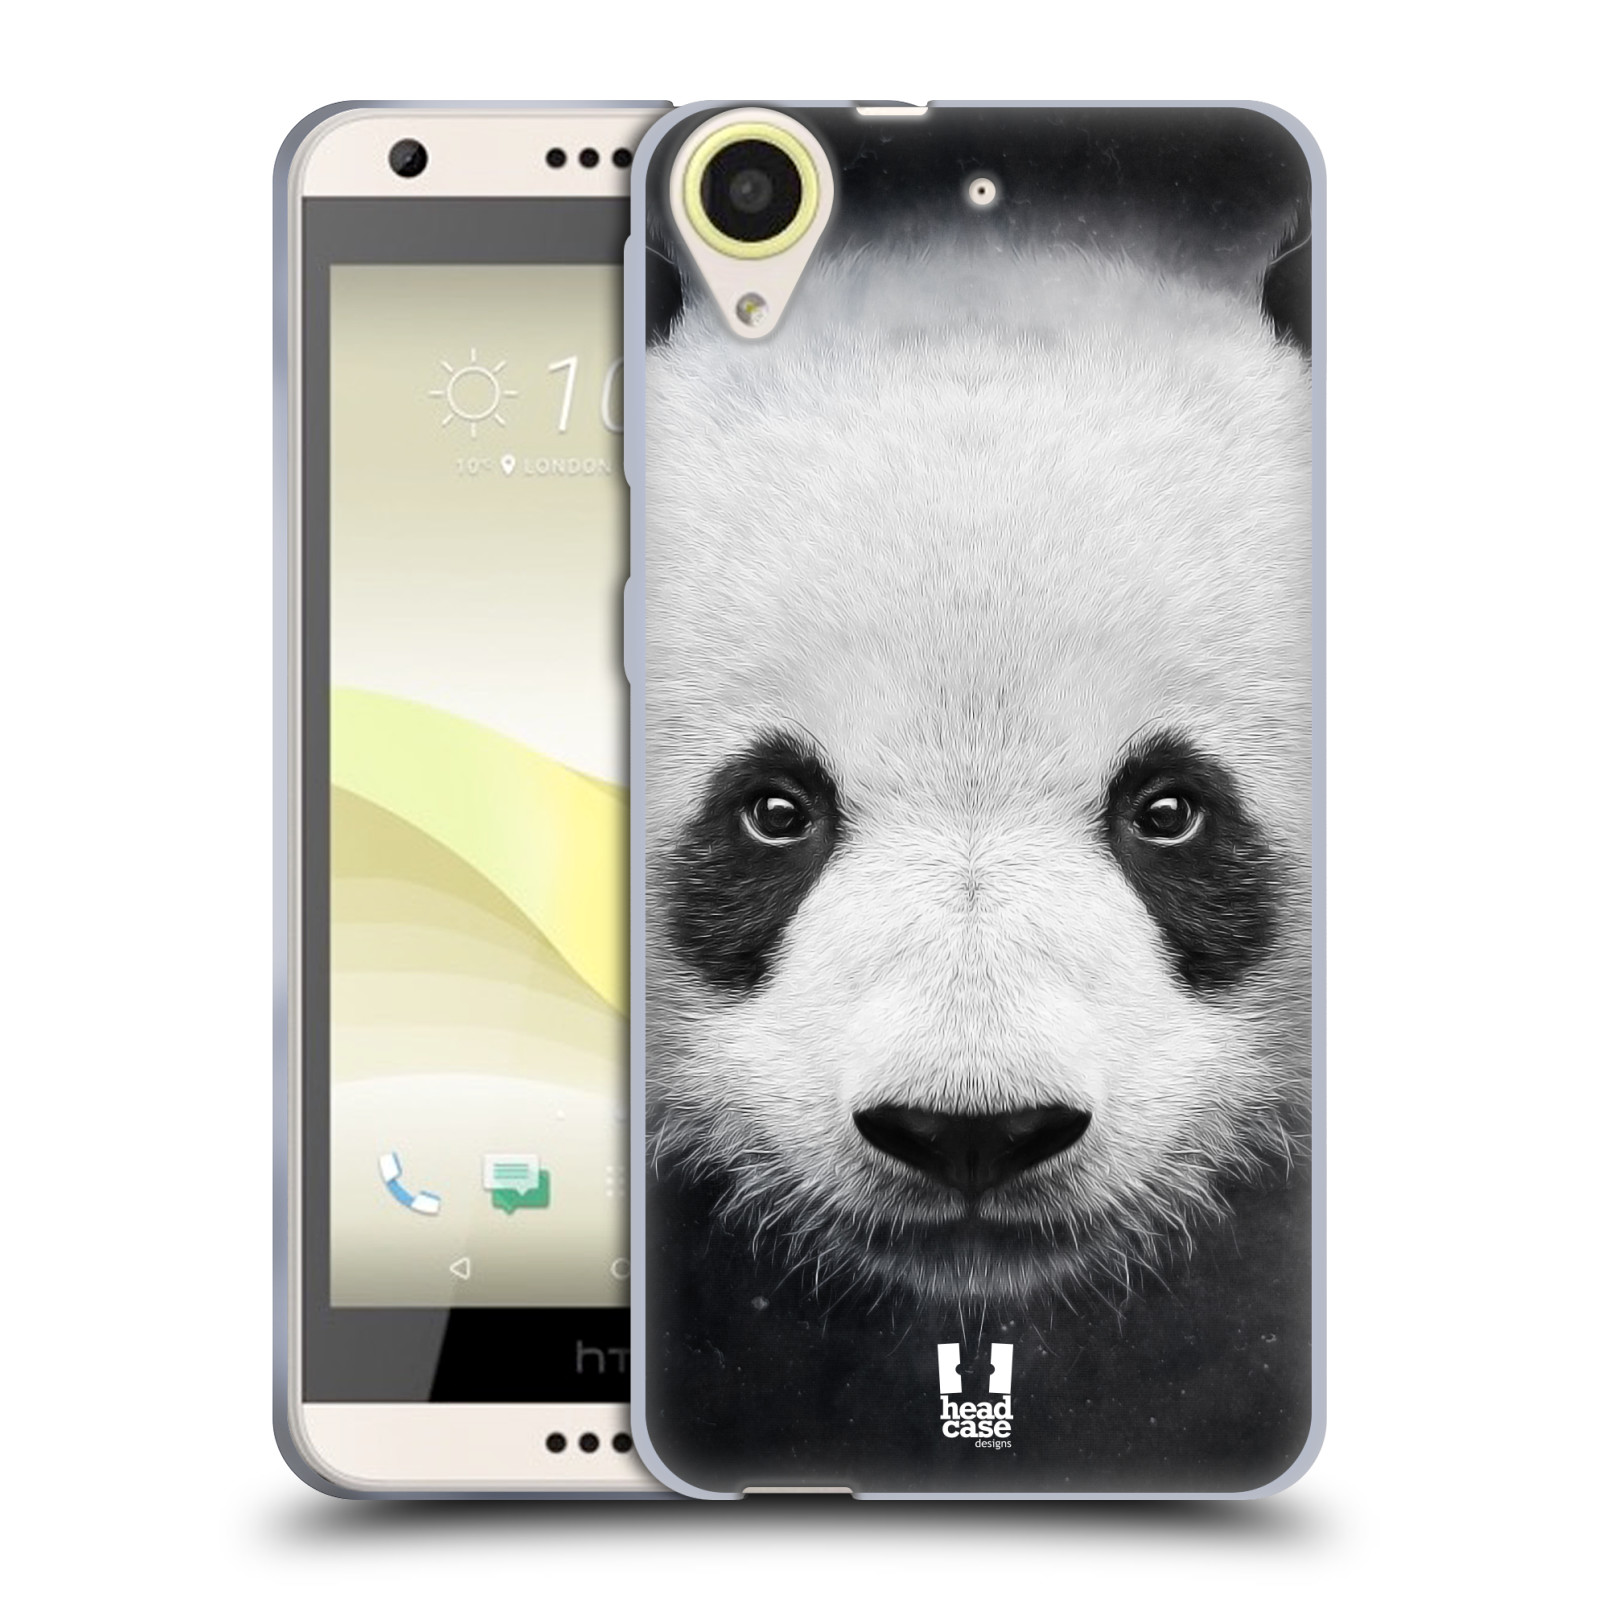 Silikonové pouzdro na mobil HTC Desire 650 HEAD CASE TVÁŘ PANDA